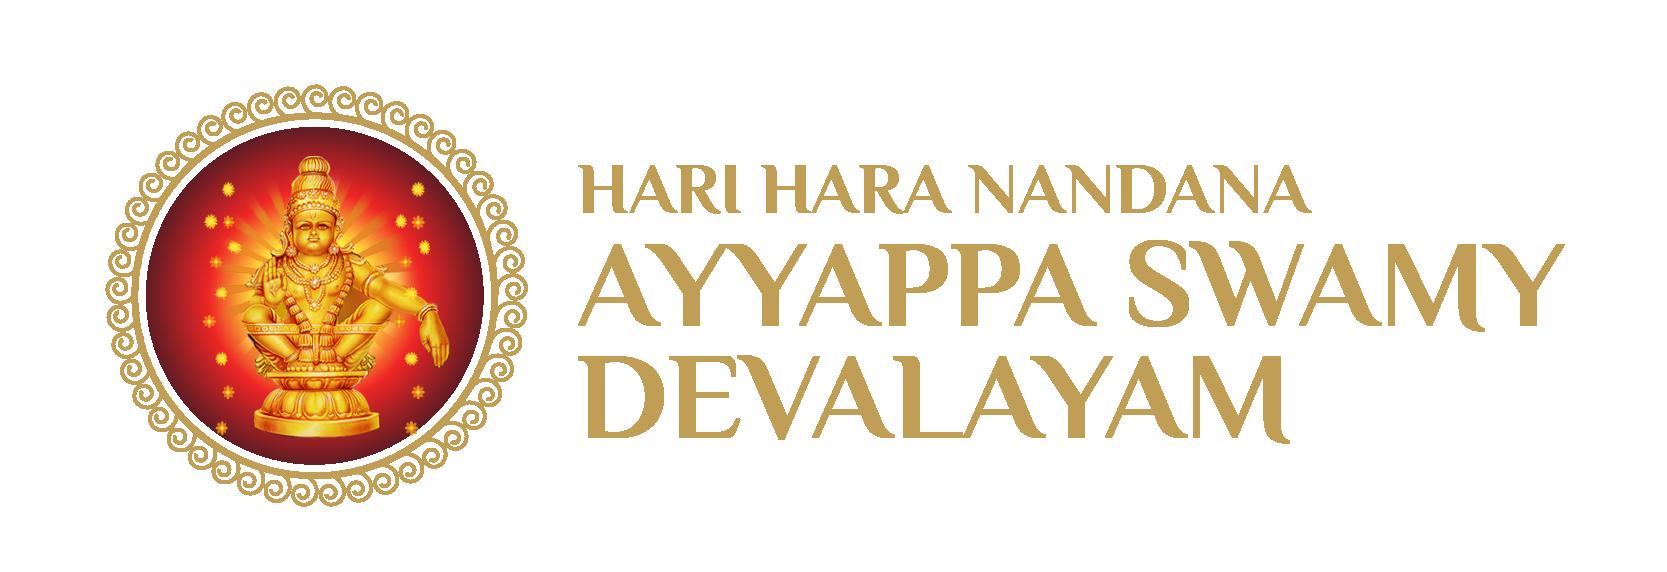 Hari Hara Nandana Ayyappa Swamy Devalayam in pudur | Hyderabad